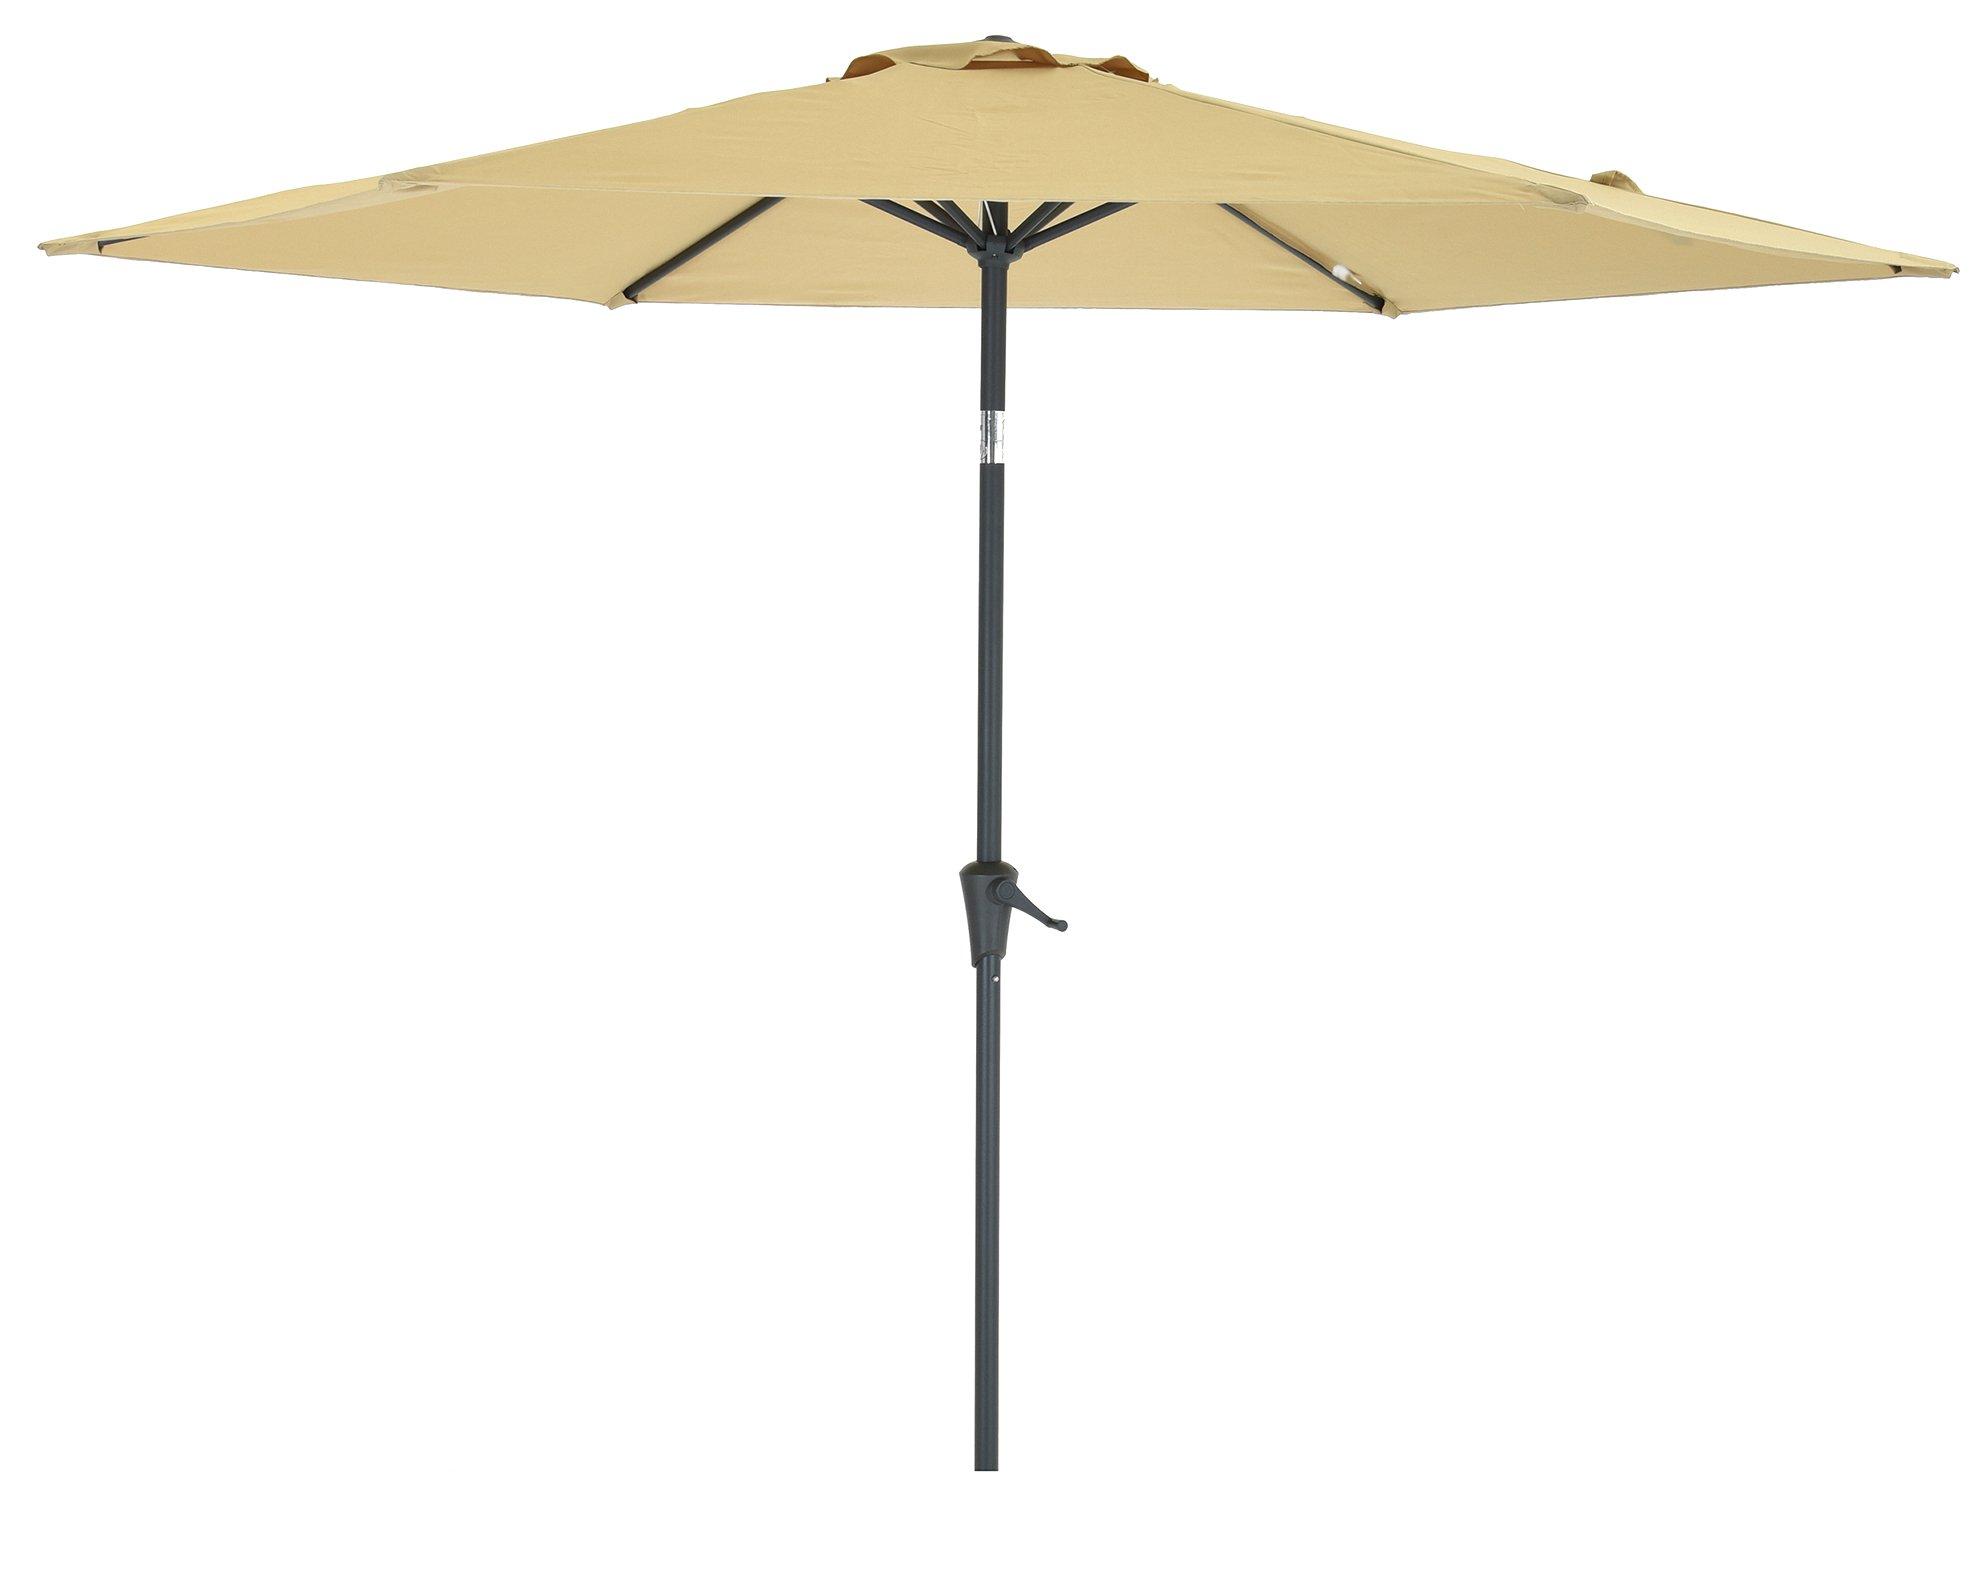 Patio Umbrella 9 Feet Beige, Market Outdoor Waterproof Table Umbrella by SHORFUNE with Push Button Tilt and Crank, Great for Patio, Backyard, Garden, Pool Side